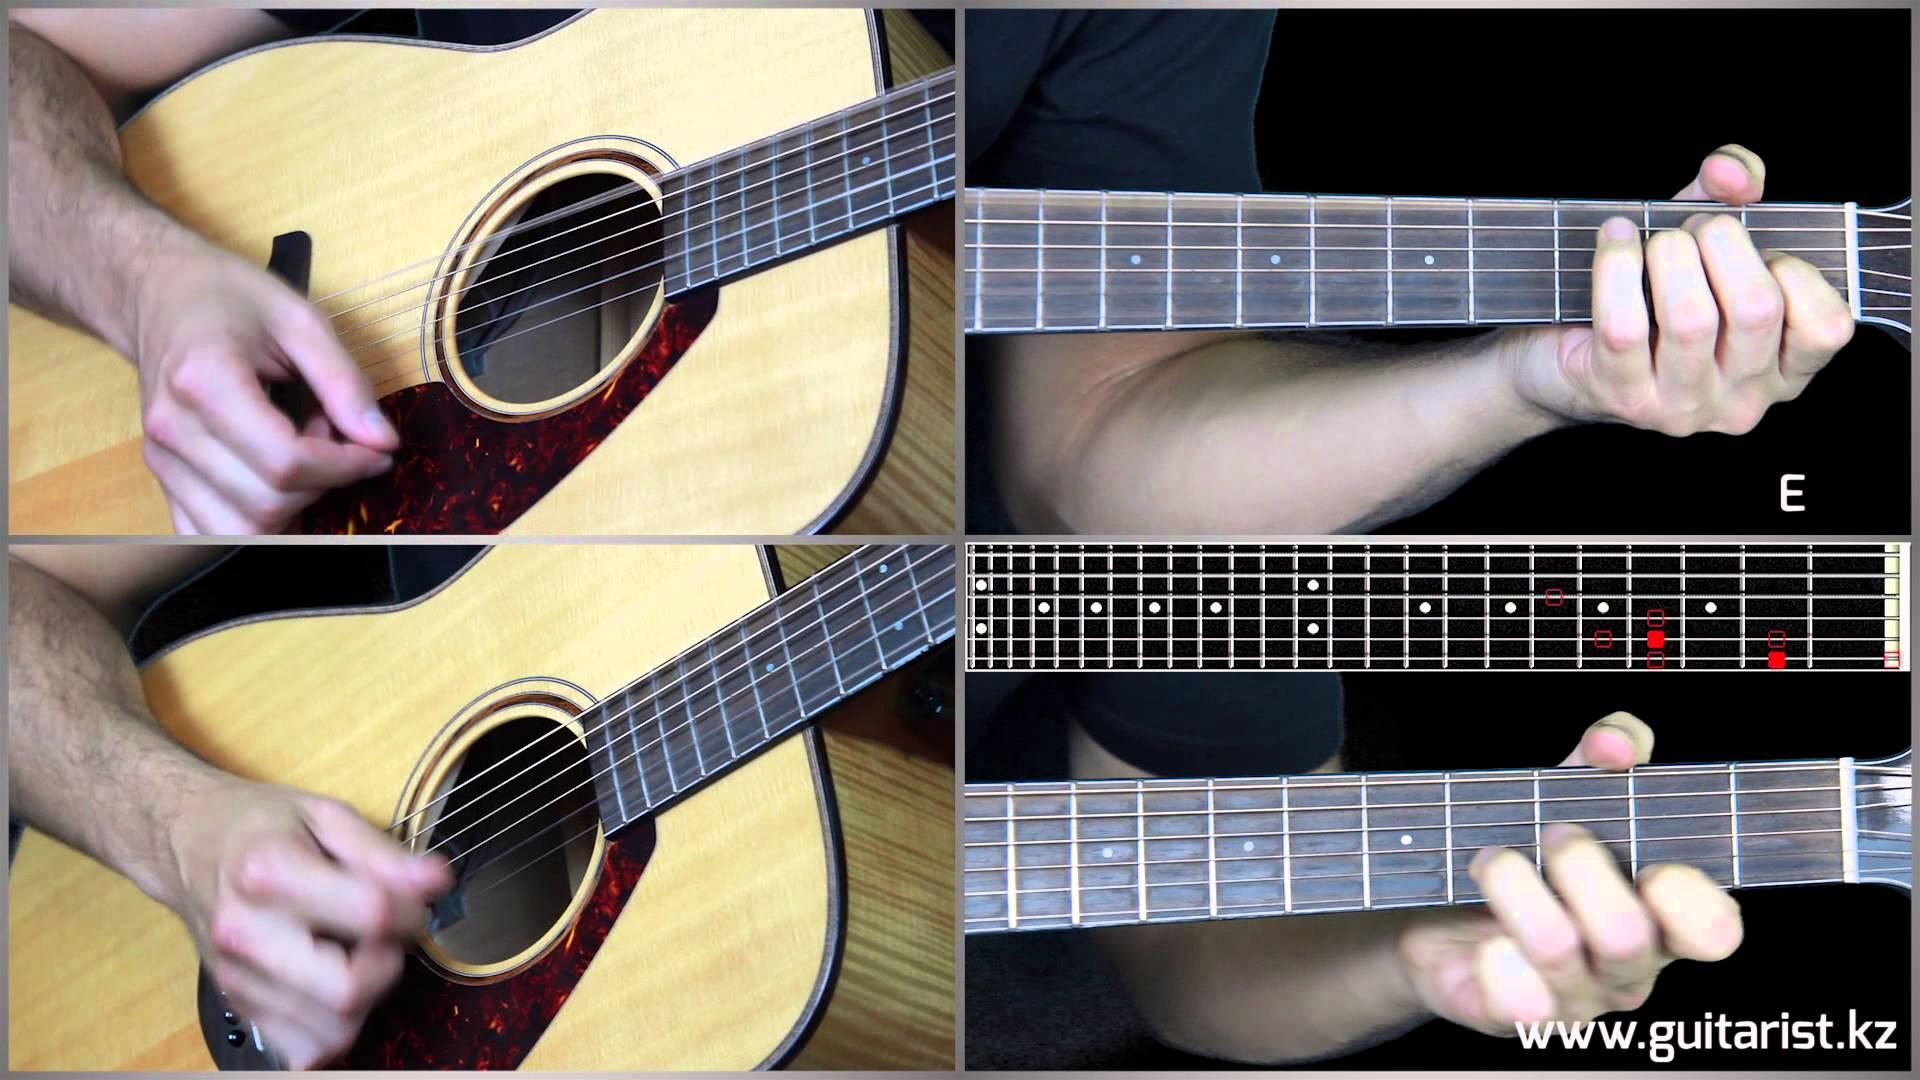 Michel Tel - Ai Se Eu Te Pego guitar lesson (Уроки игры на гитаре Guitarist.kz)